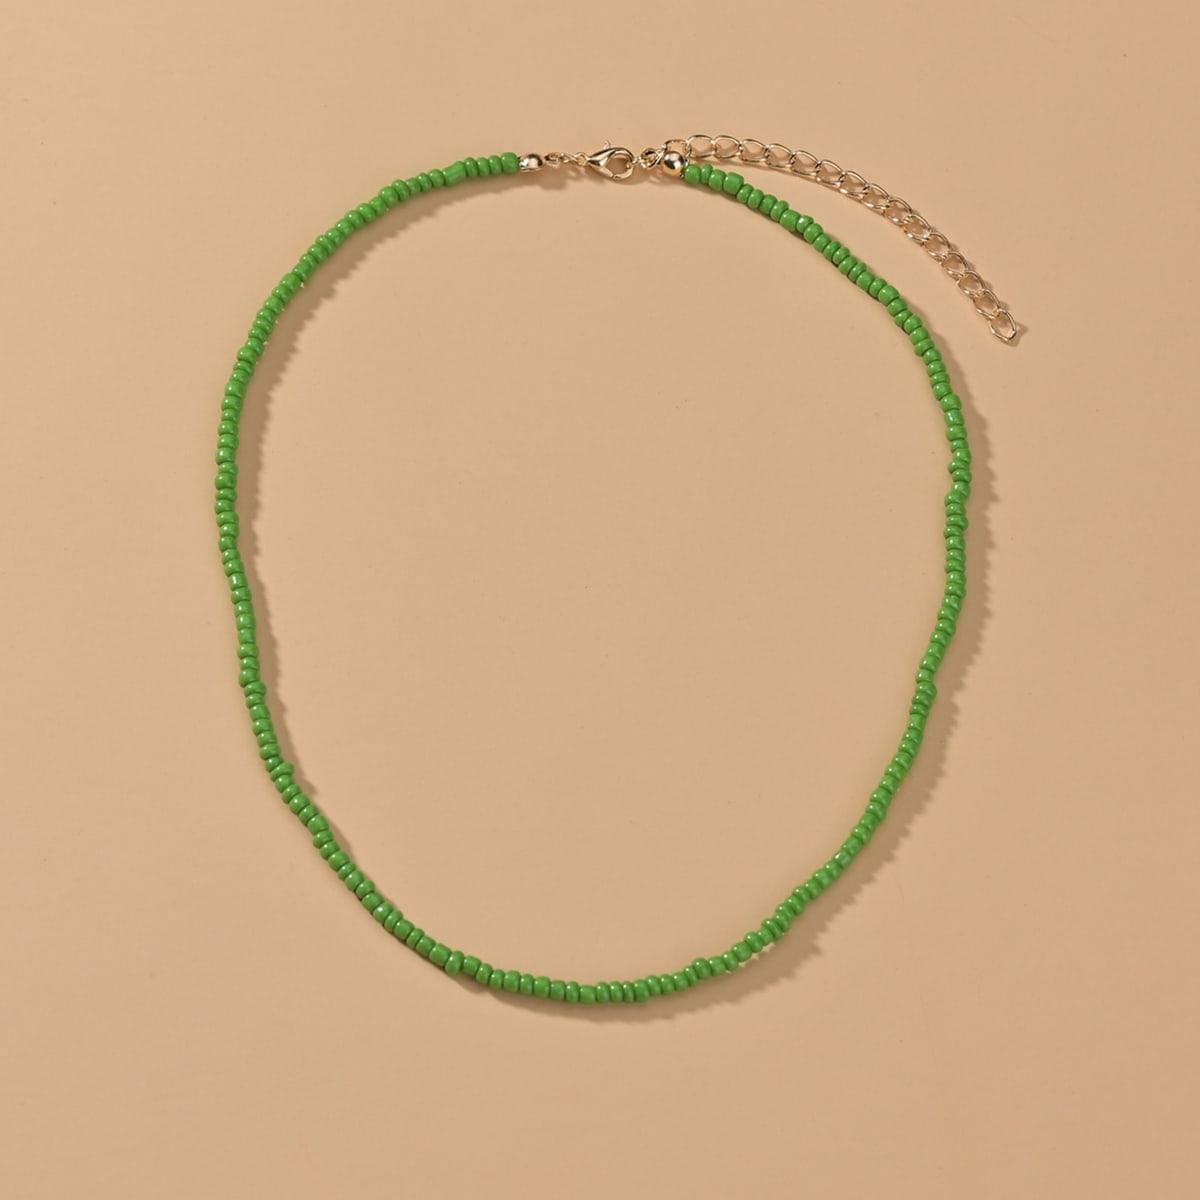 1шт ожерелье из бусин по цене 80